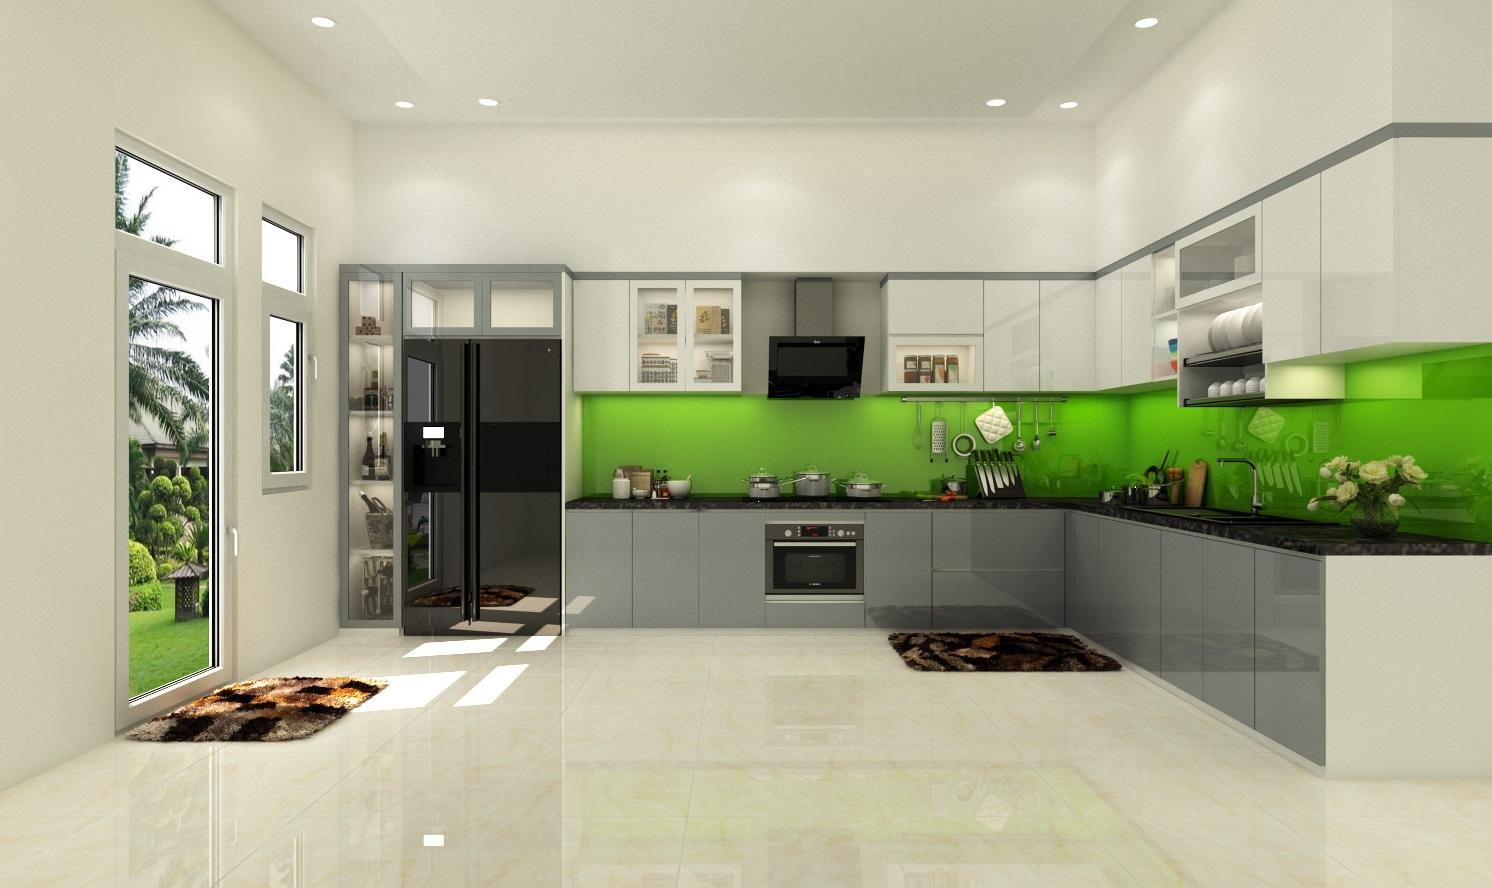 Image result for Tủ bếp Acrylic bóng gương giá rẻ